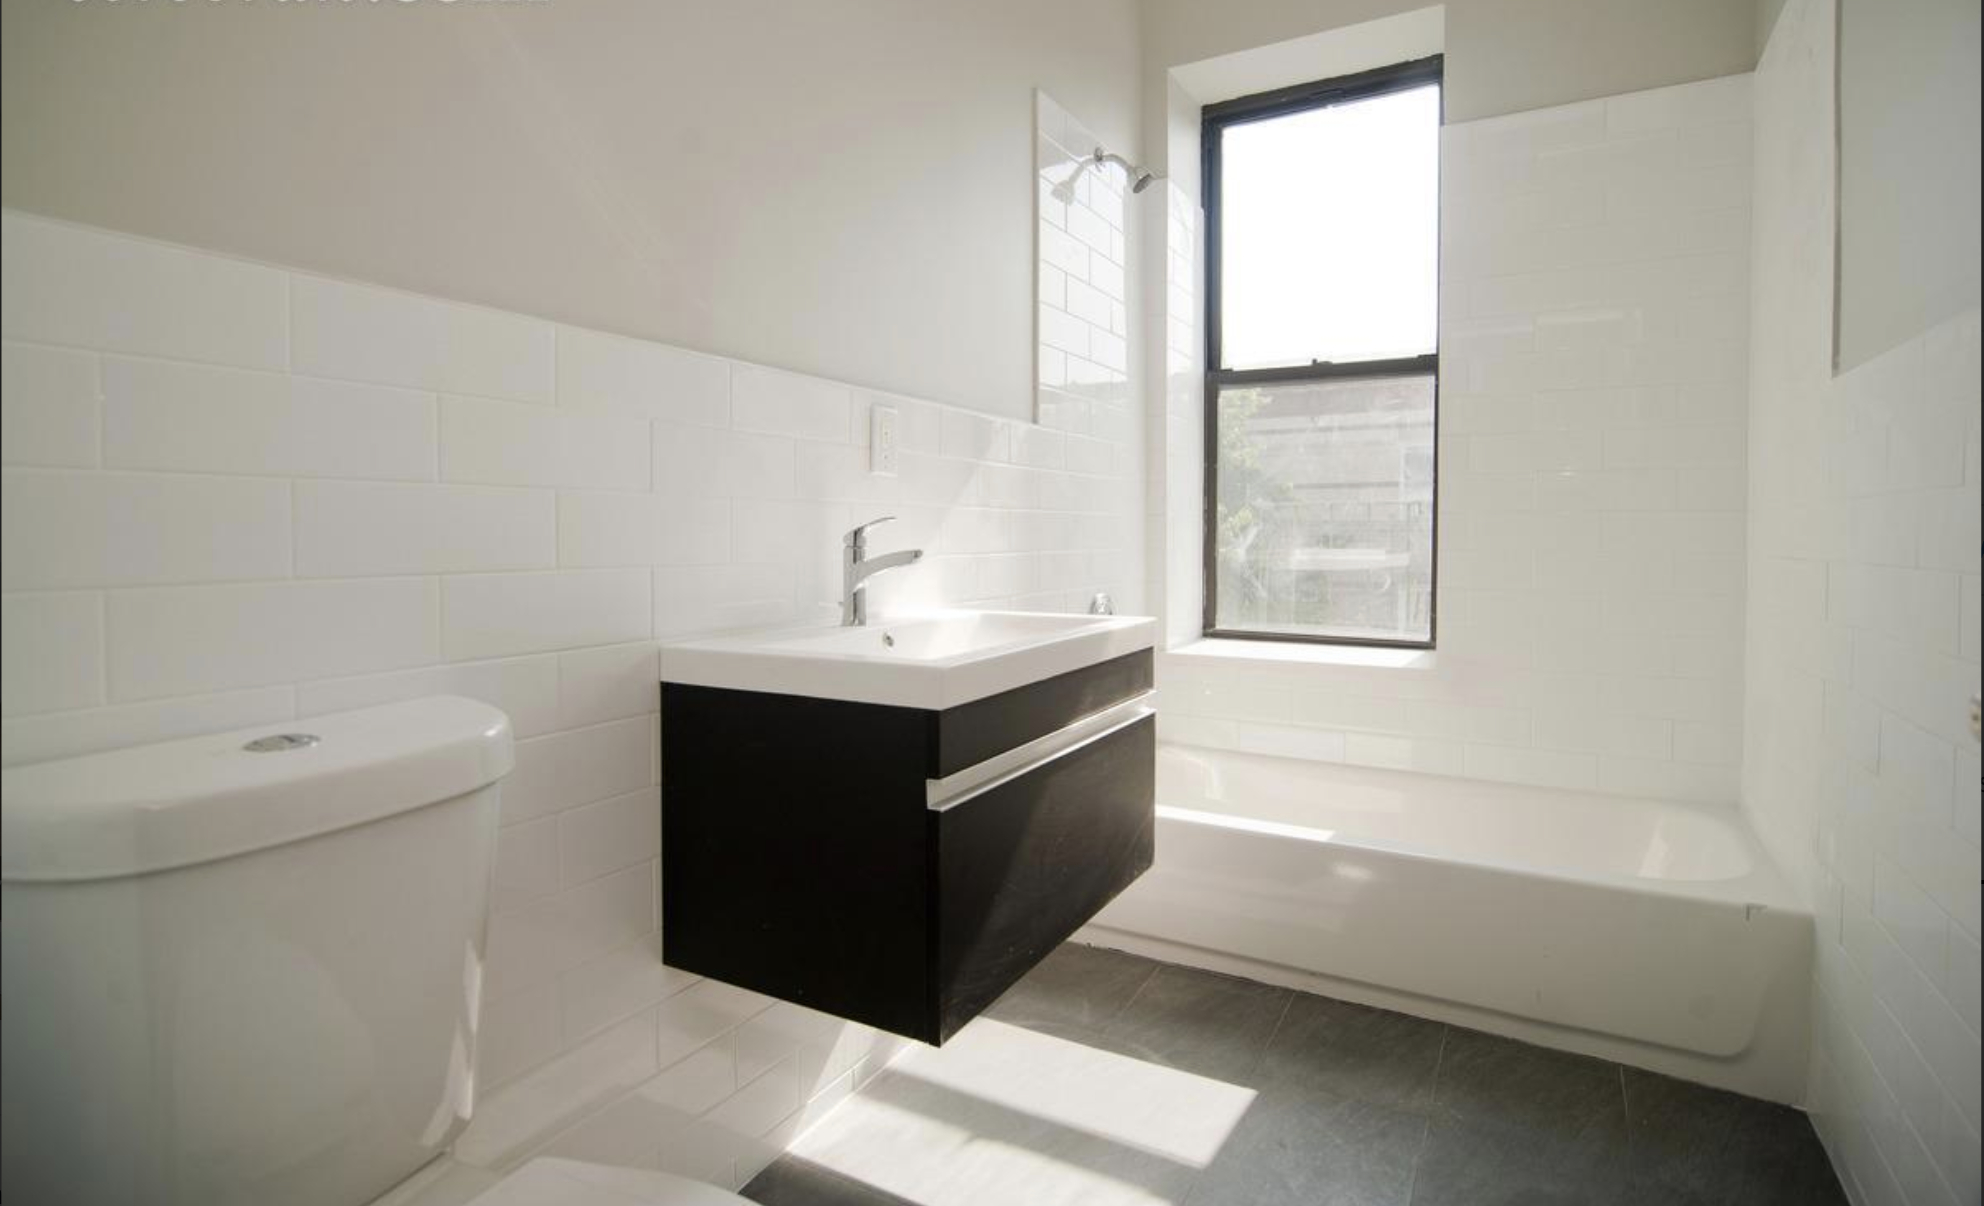 426 Bainbridge Street Bathroom .png